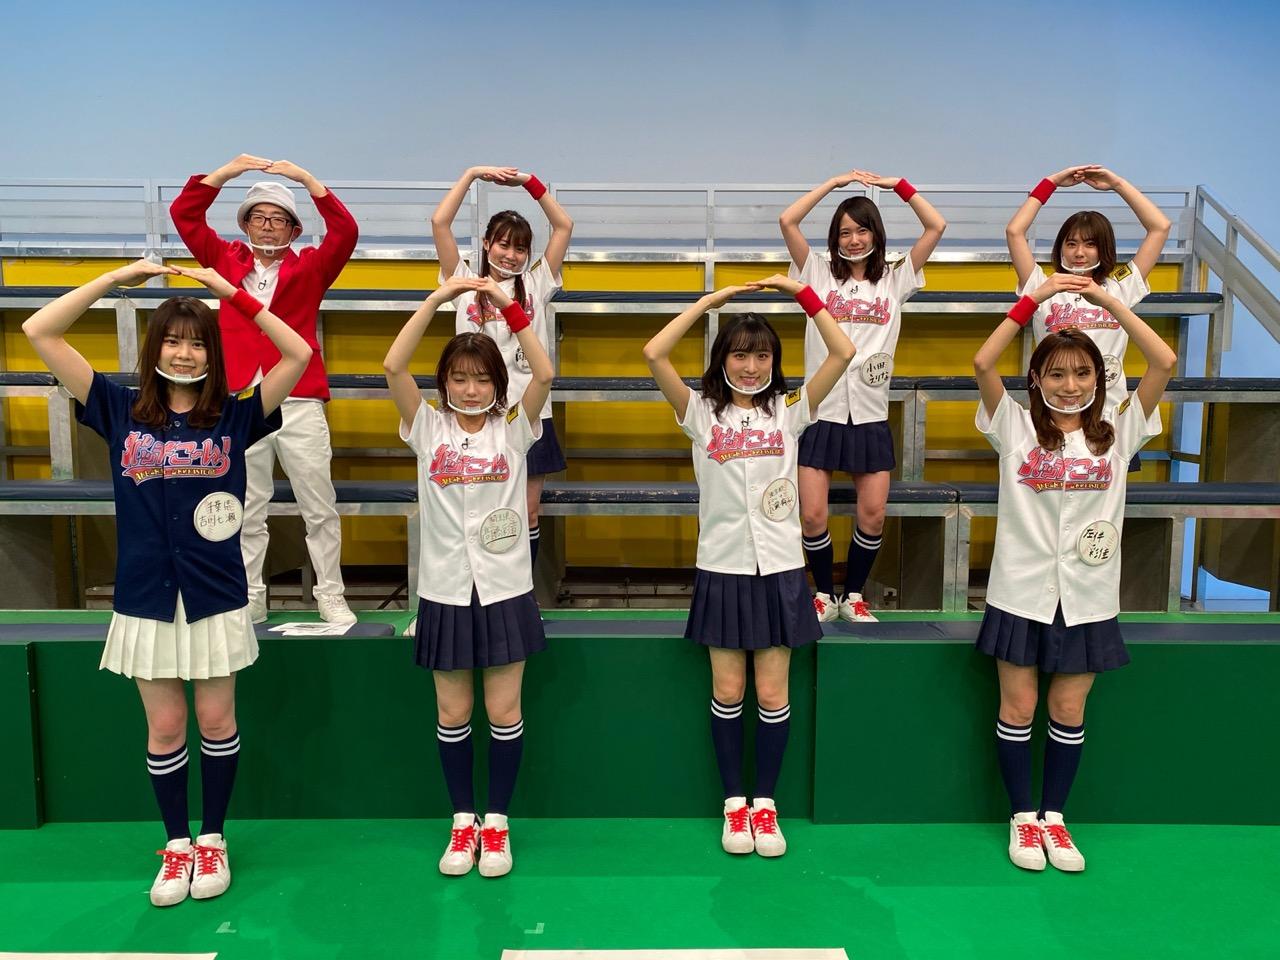 「AKB48チーム8のKANTO白書 バッチこーい!」#80:目指せ8888人!バッチバチ!公式アカウントフォロワーアップ大作戦!【チバテレ】